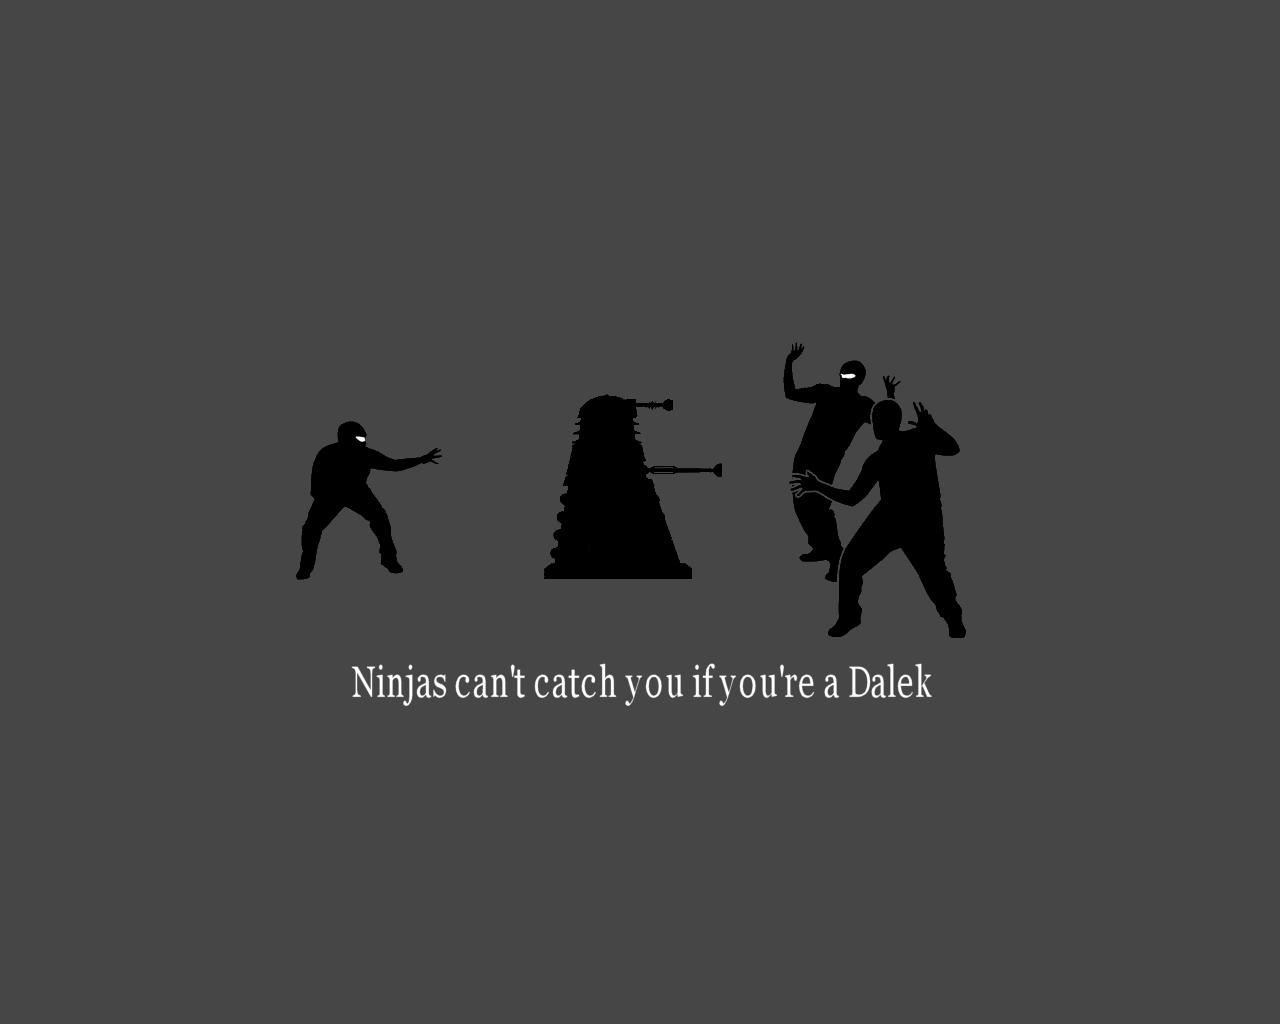 brackgrounds plz. heres mine. Ninjas a Dalek. I have a few favorites brackgrounds plz heres mine Ninjas a Dalek I have few favorites